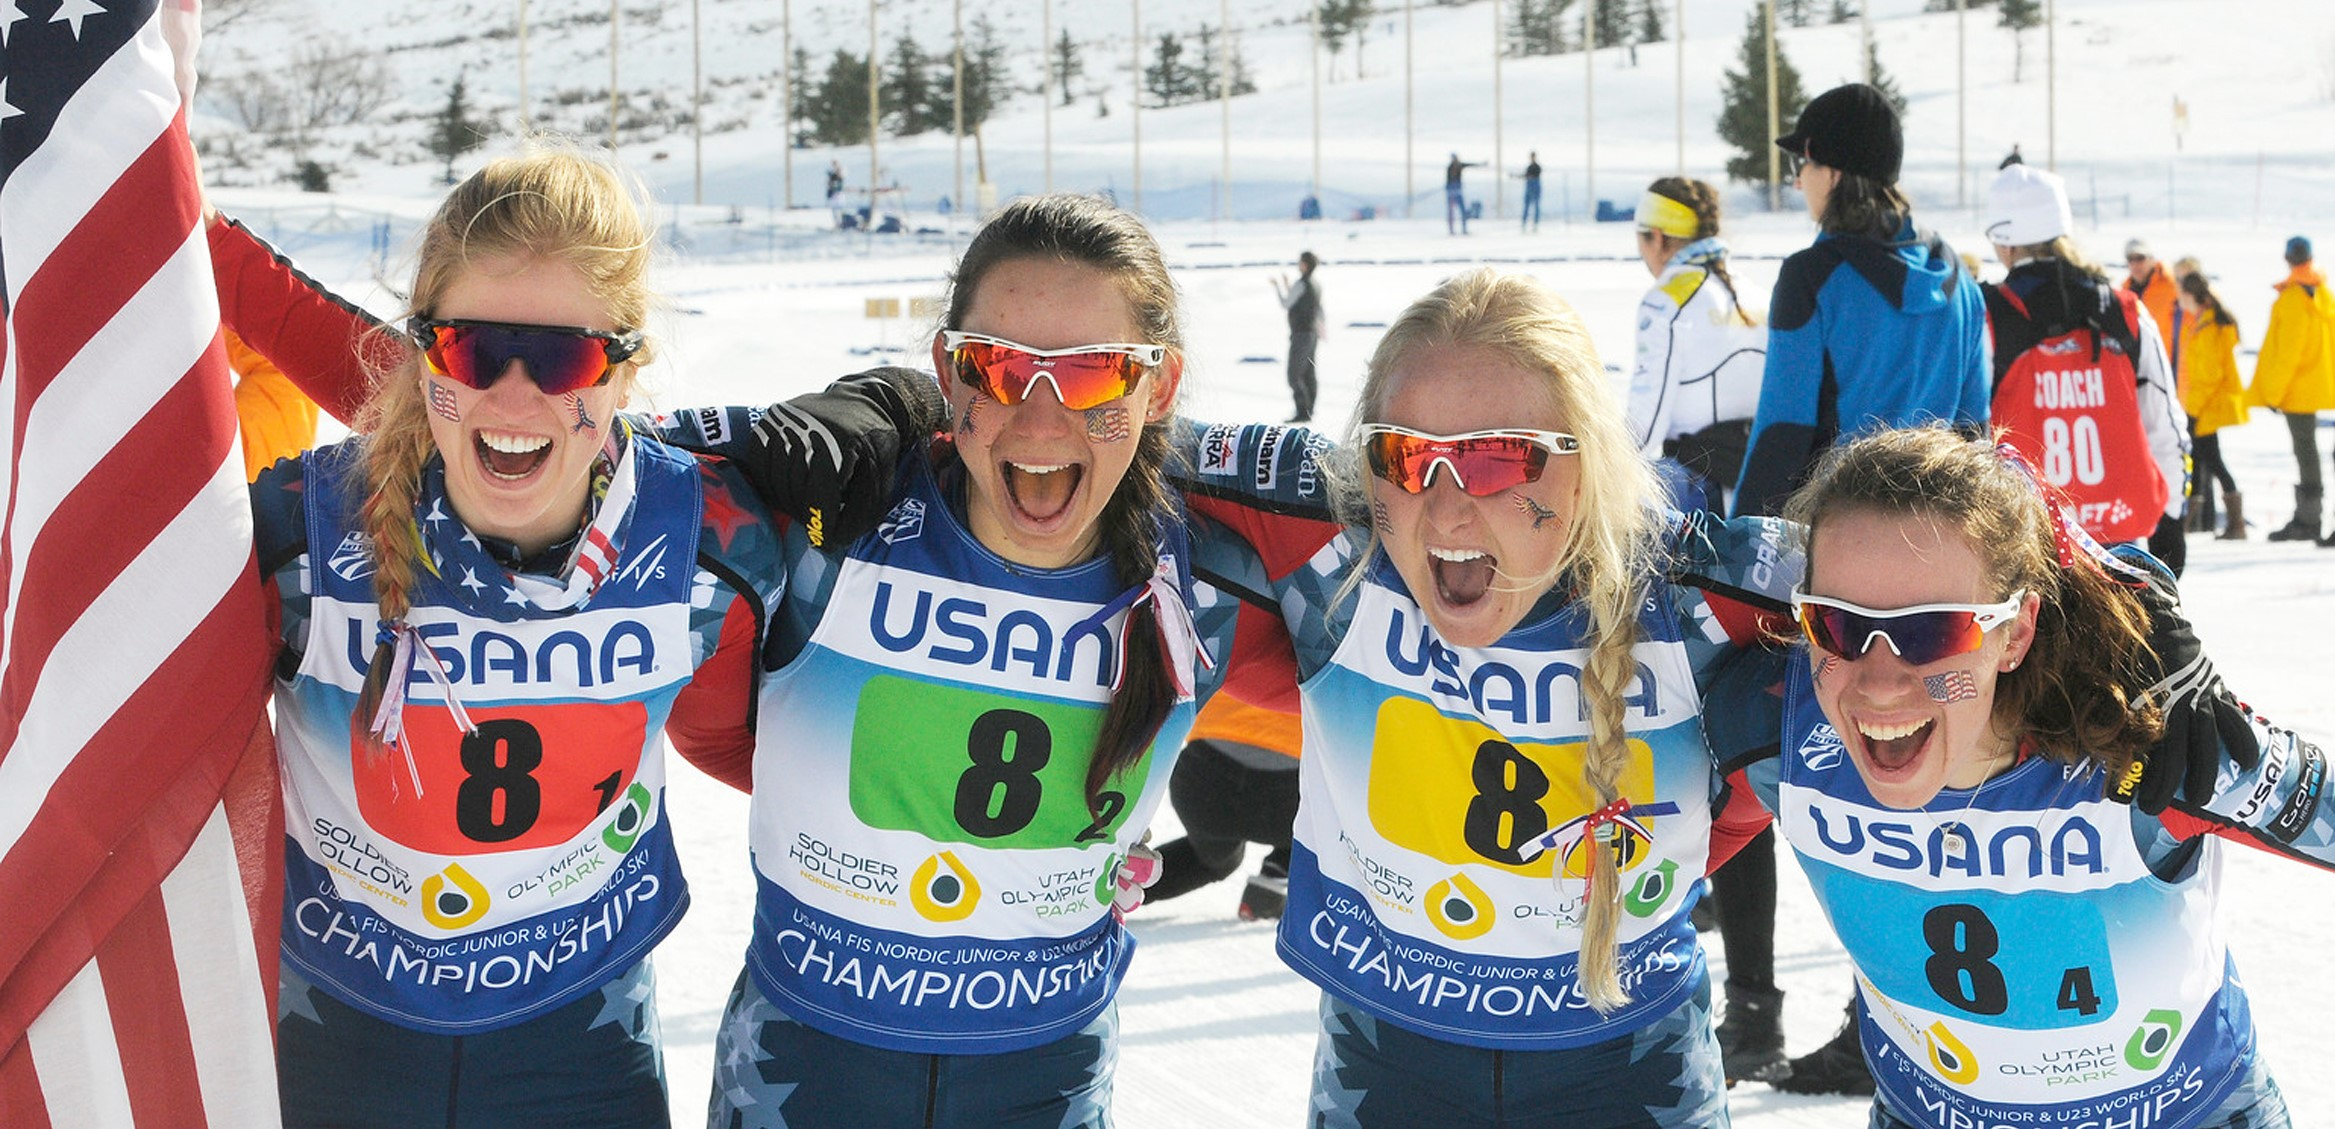 kayak turnuvalari nasil yapilir